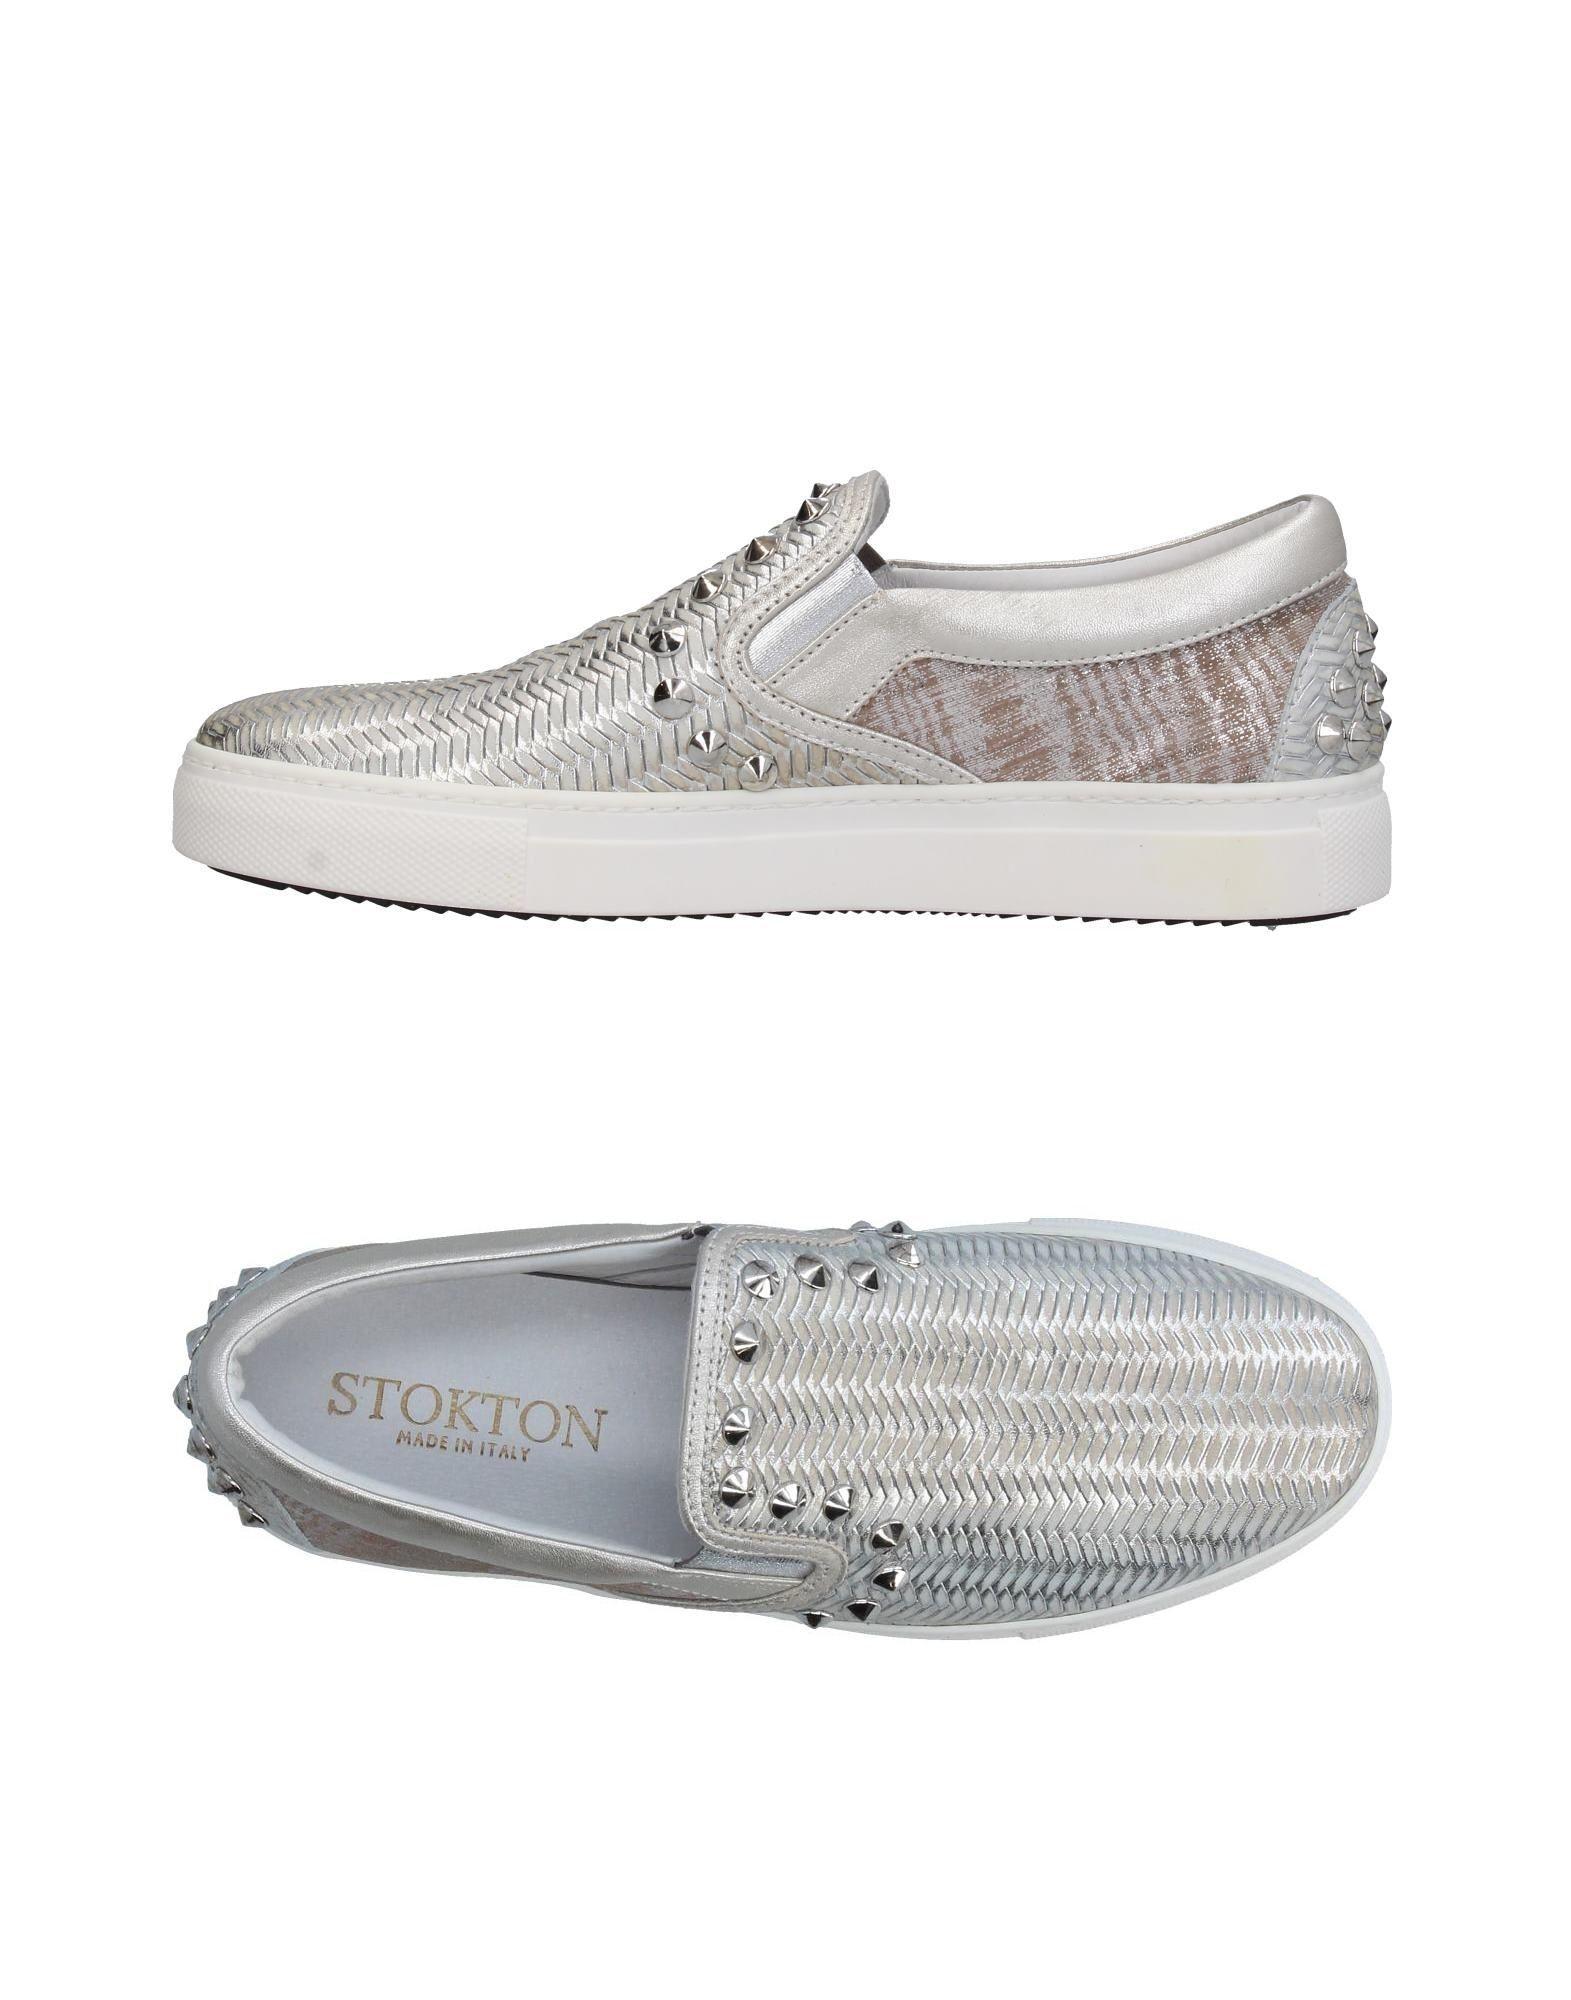 Moda Sneakers Stokton Donna - 11360872VV